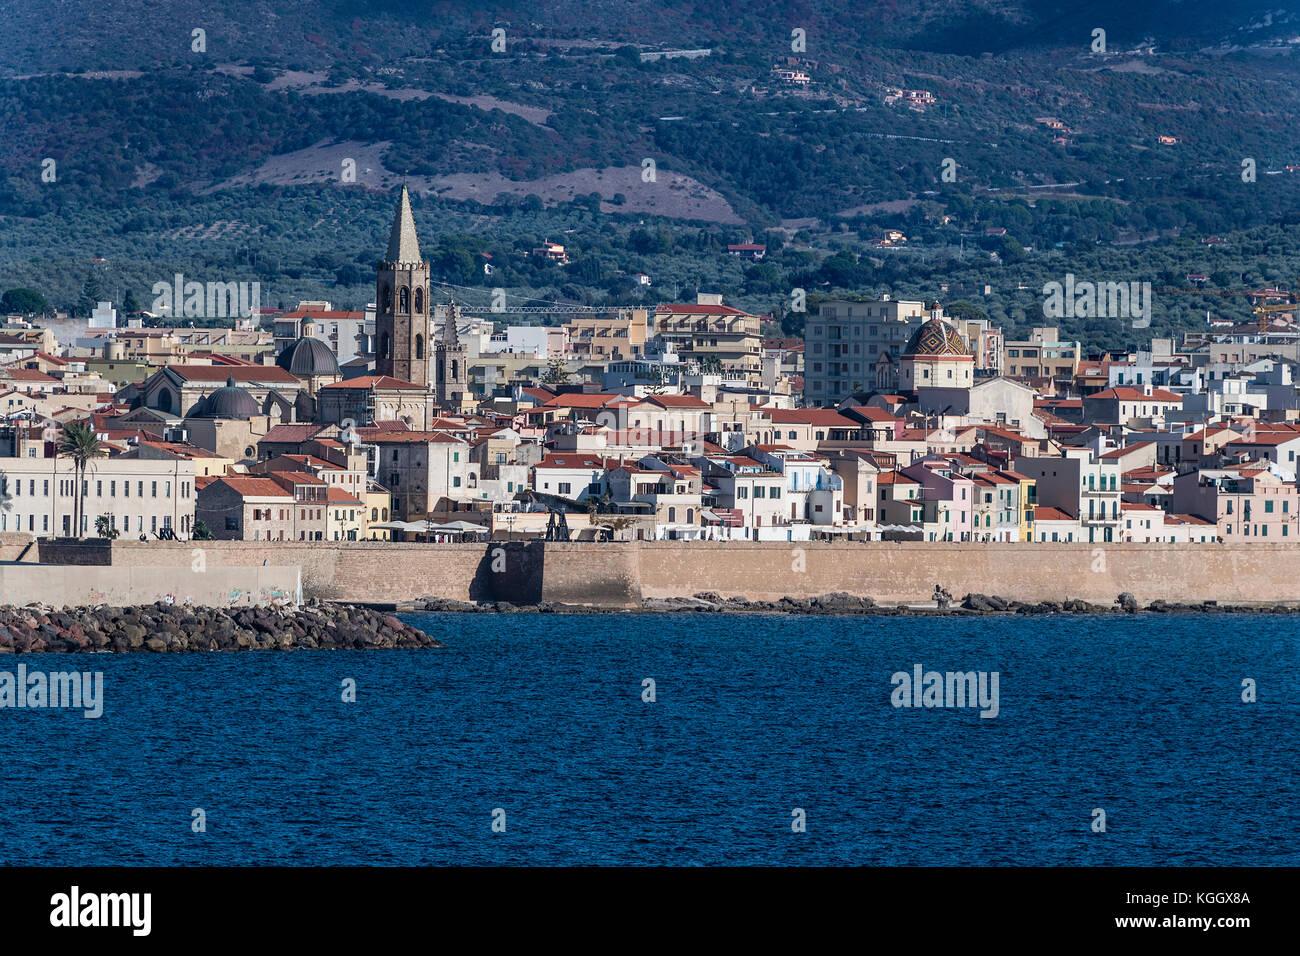 Paysage urbain d'Alghero, Sardaigne, Italie Photo Stock